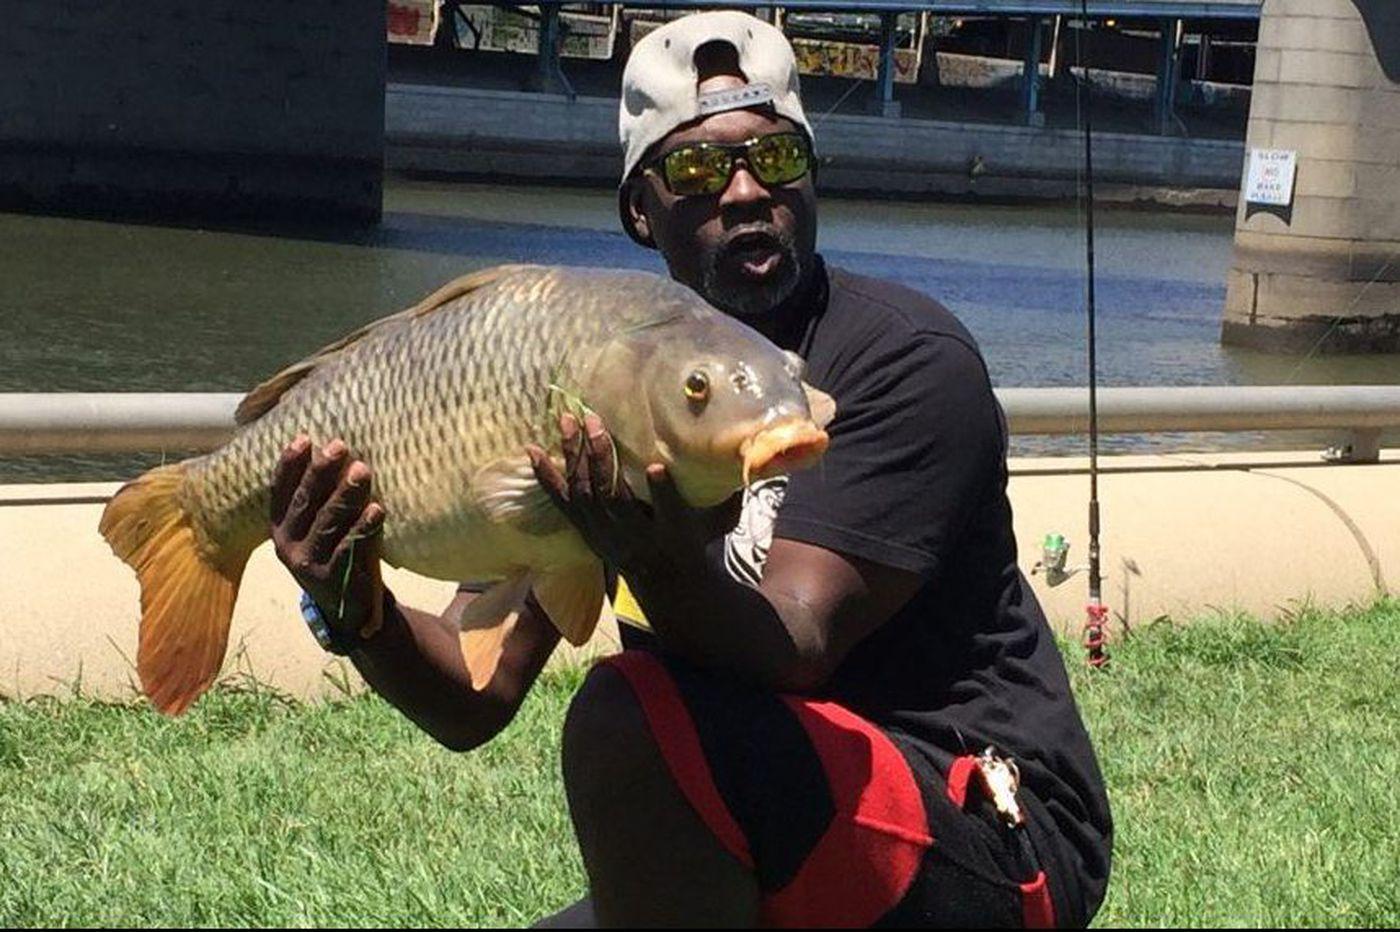 Carpe Diem: 30-pound fish caught in the Schuylkill